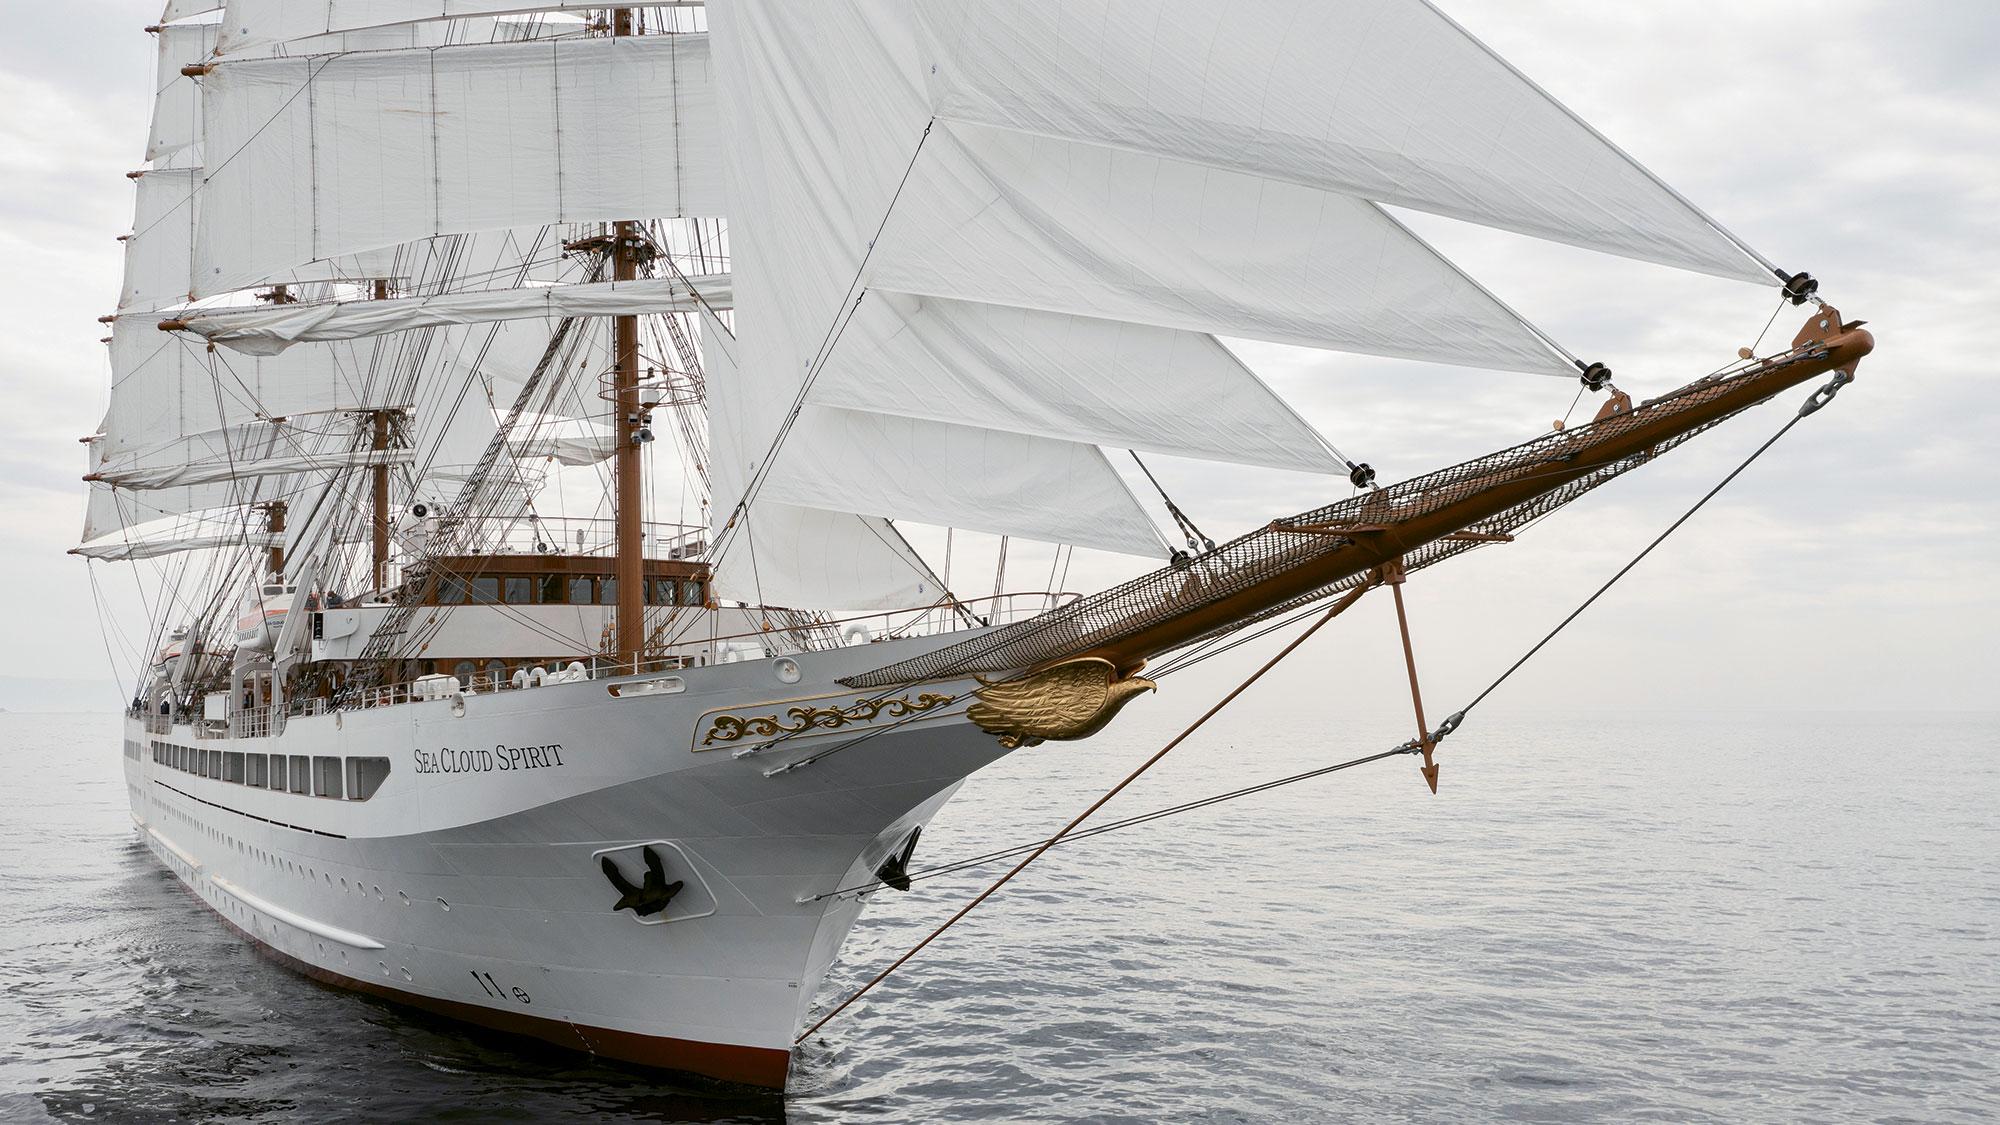 Spanish duchess to be godmother of Sea Cloud Spirit